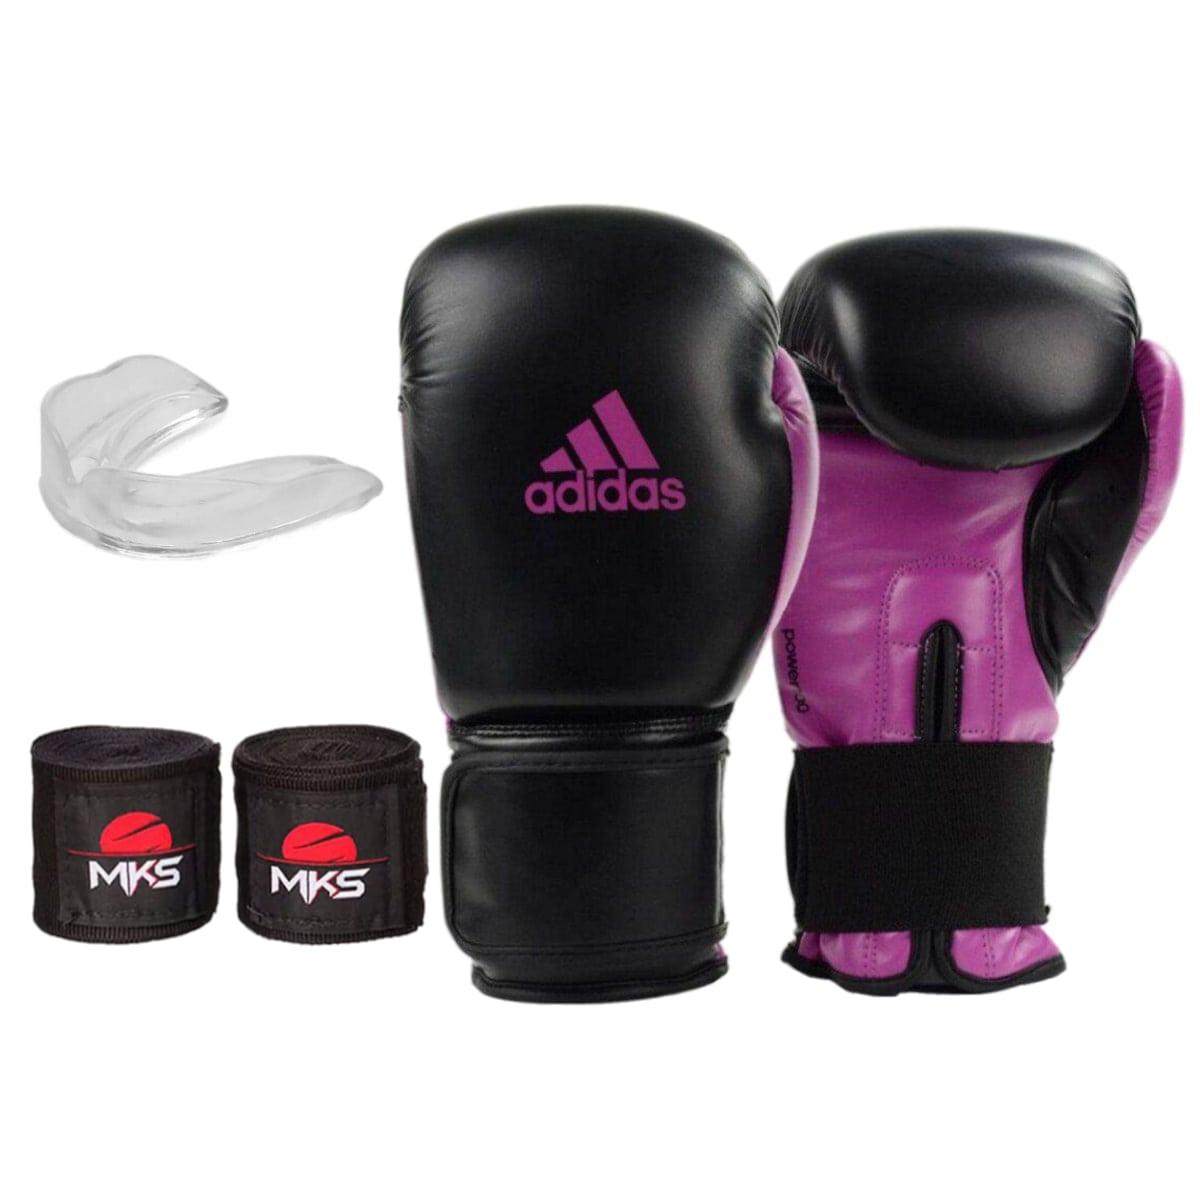 Kit Boxe Adidas Power 100: Luva + Bandagem + Bucal - Preto e Rosa